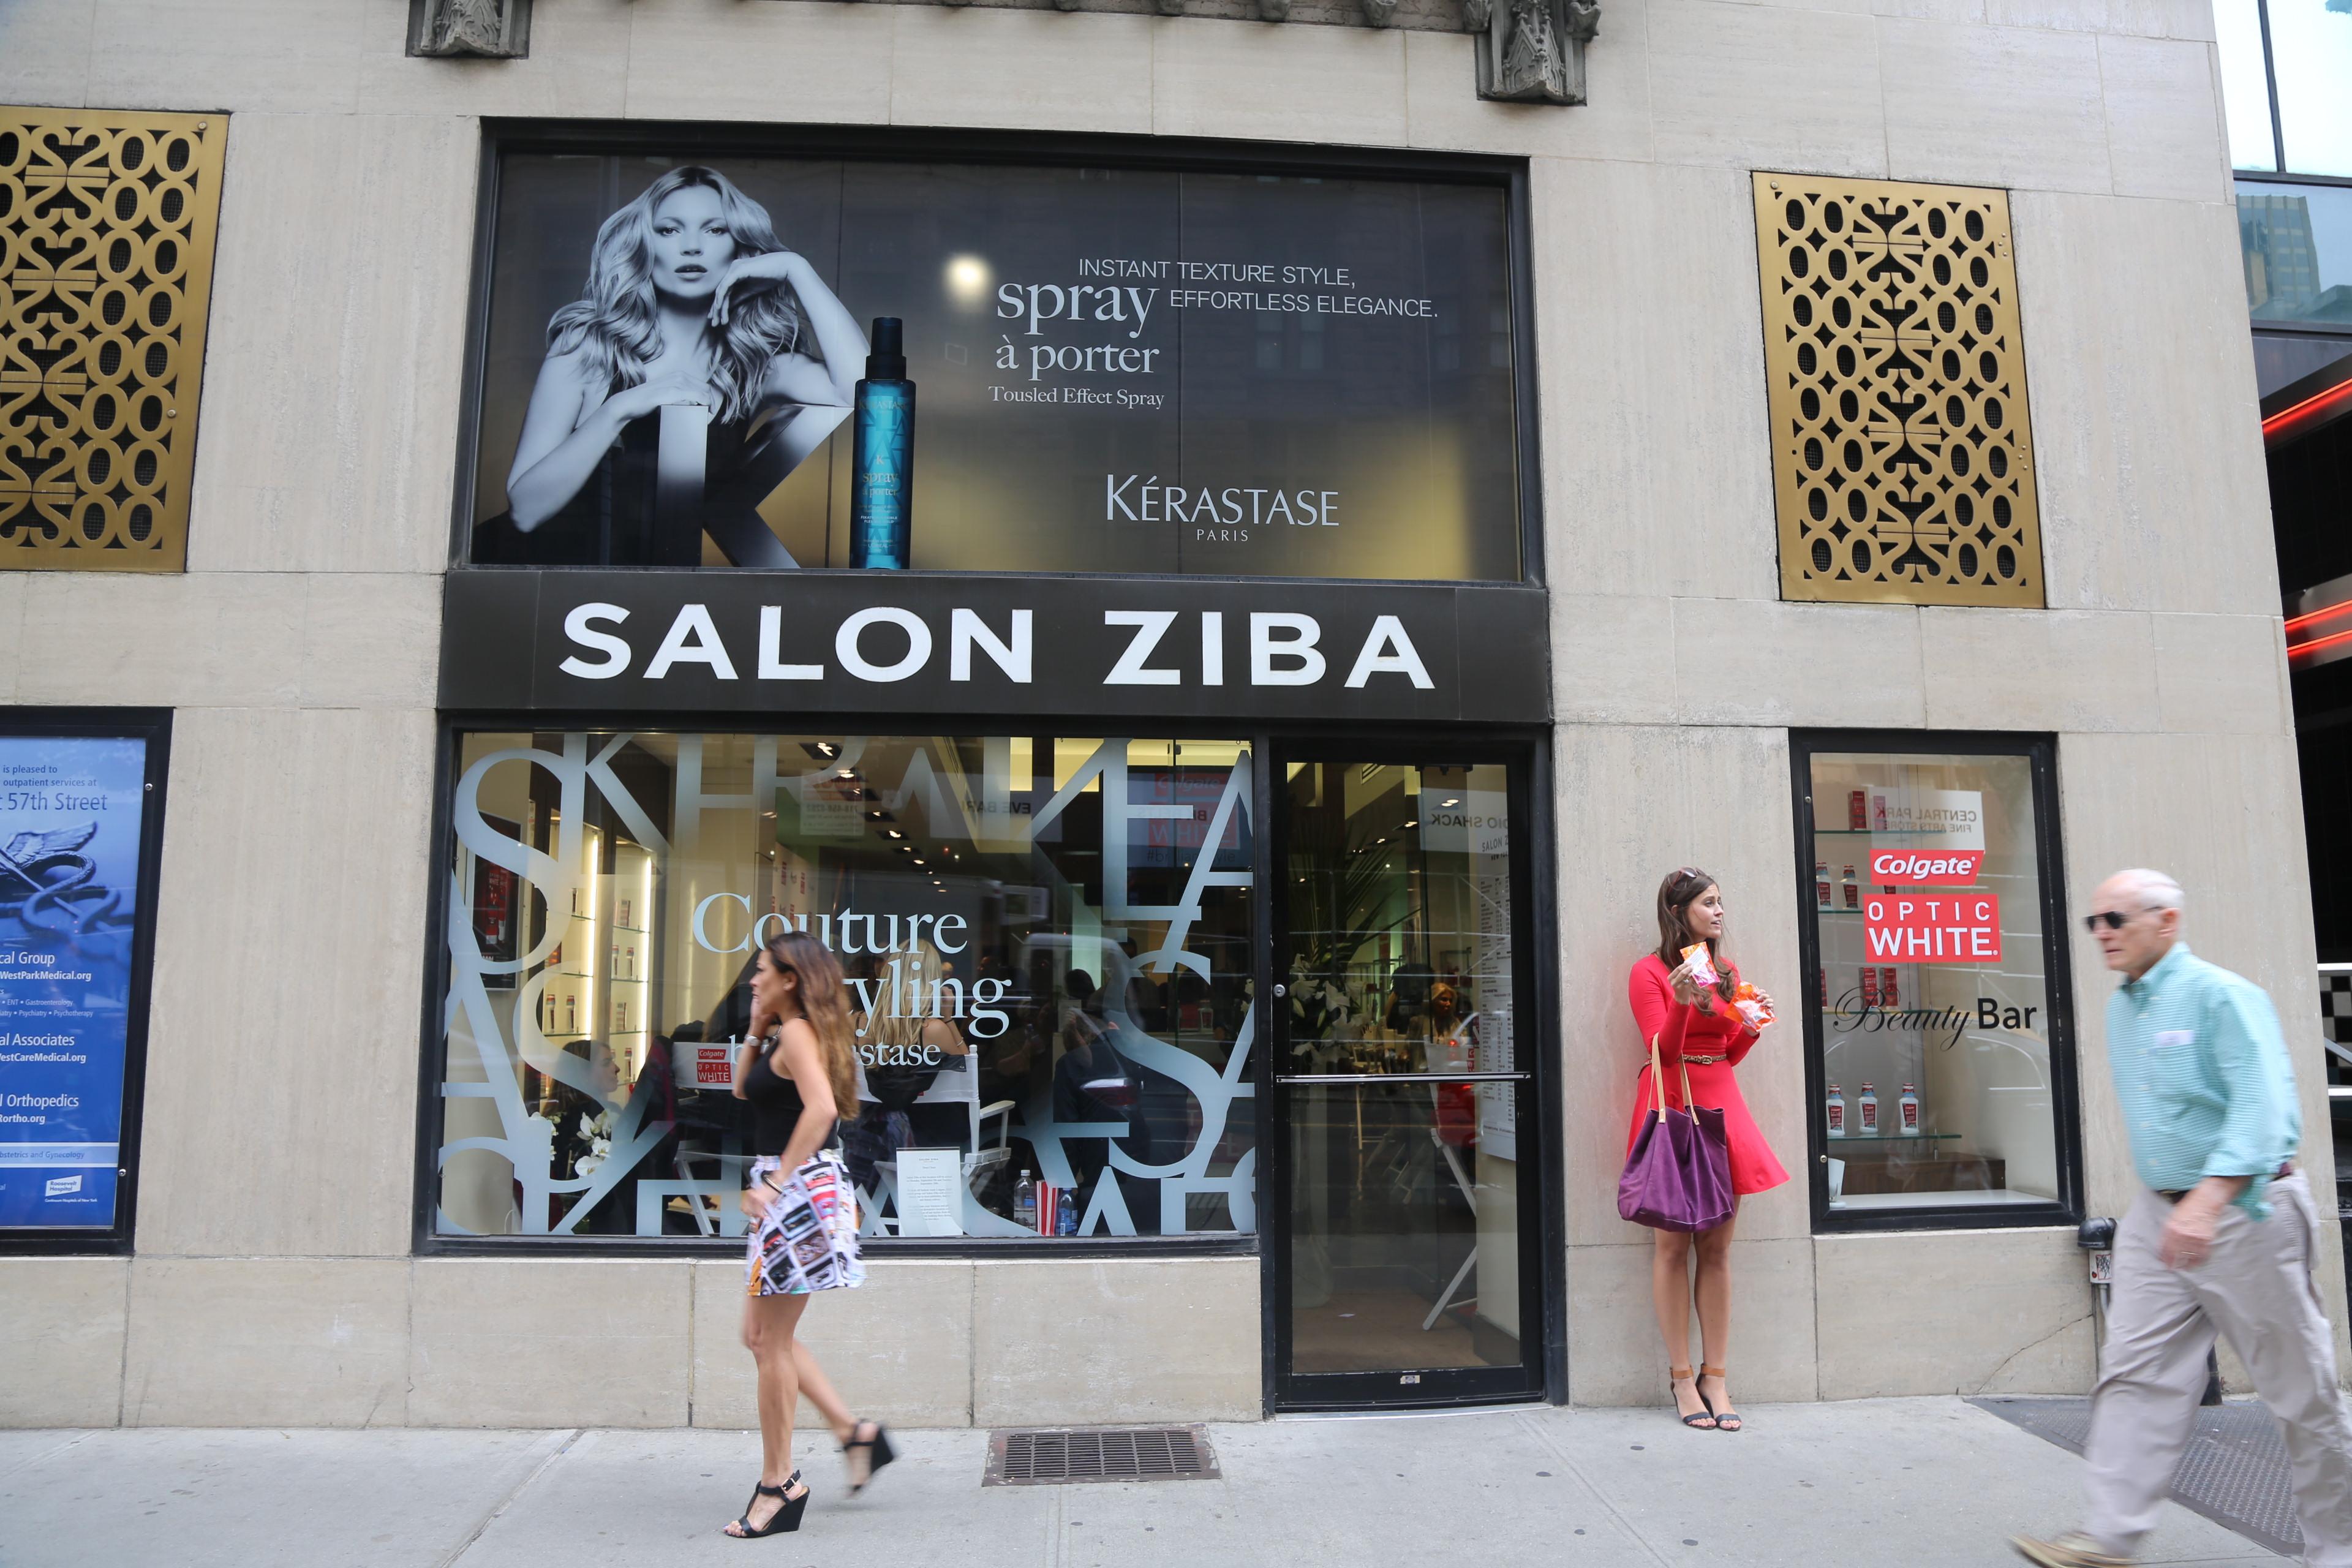 NYFW Satya Jewelry The Colgate Optic White Beauty Bar